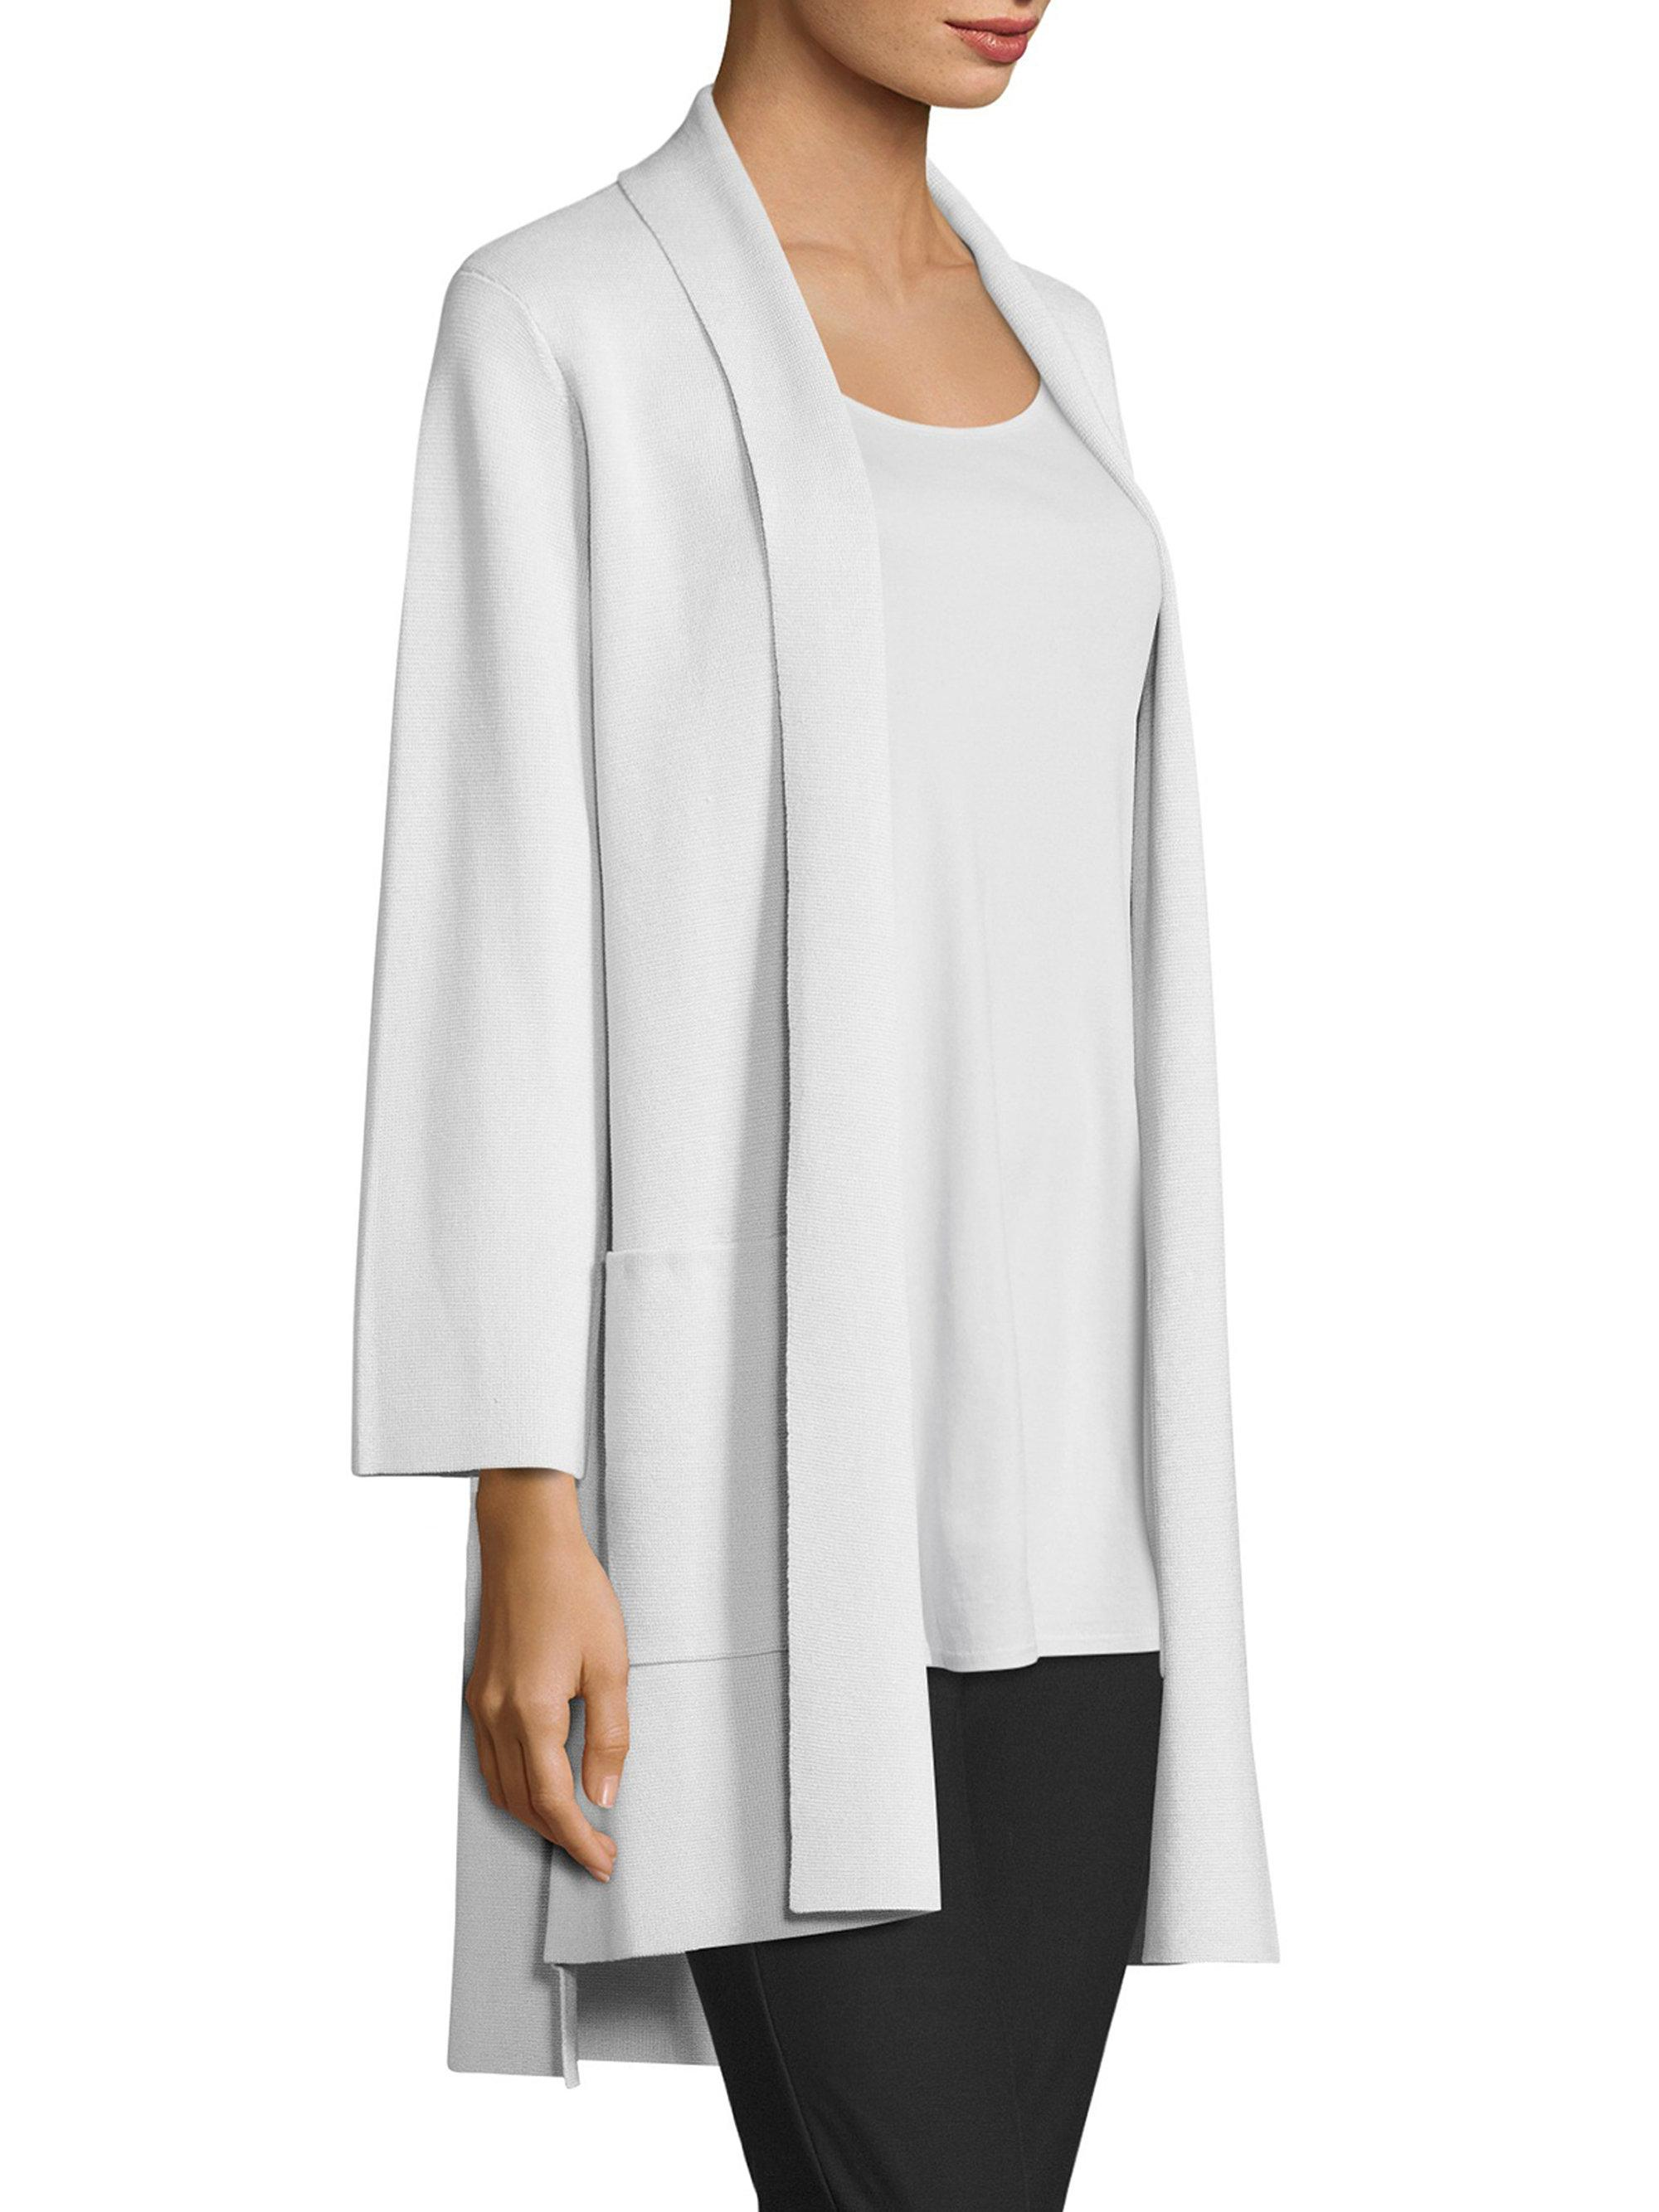 Eileen fisher Silk & Organic Cotton Kimono Cardigan in White | Lyst